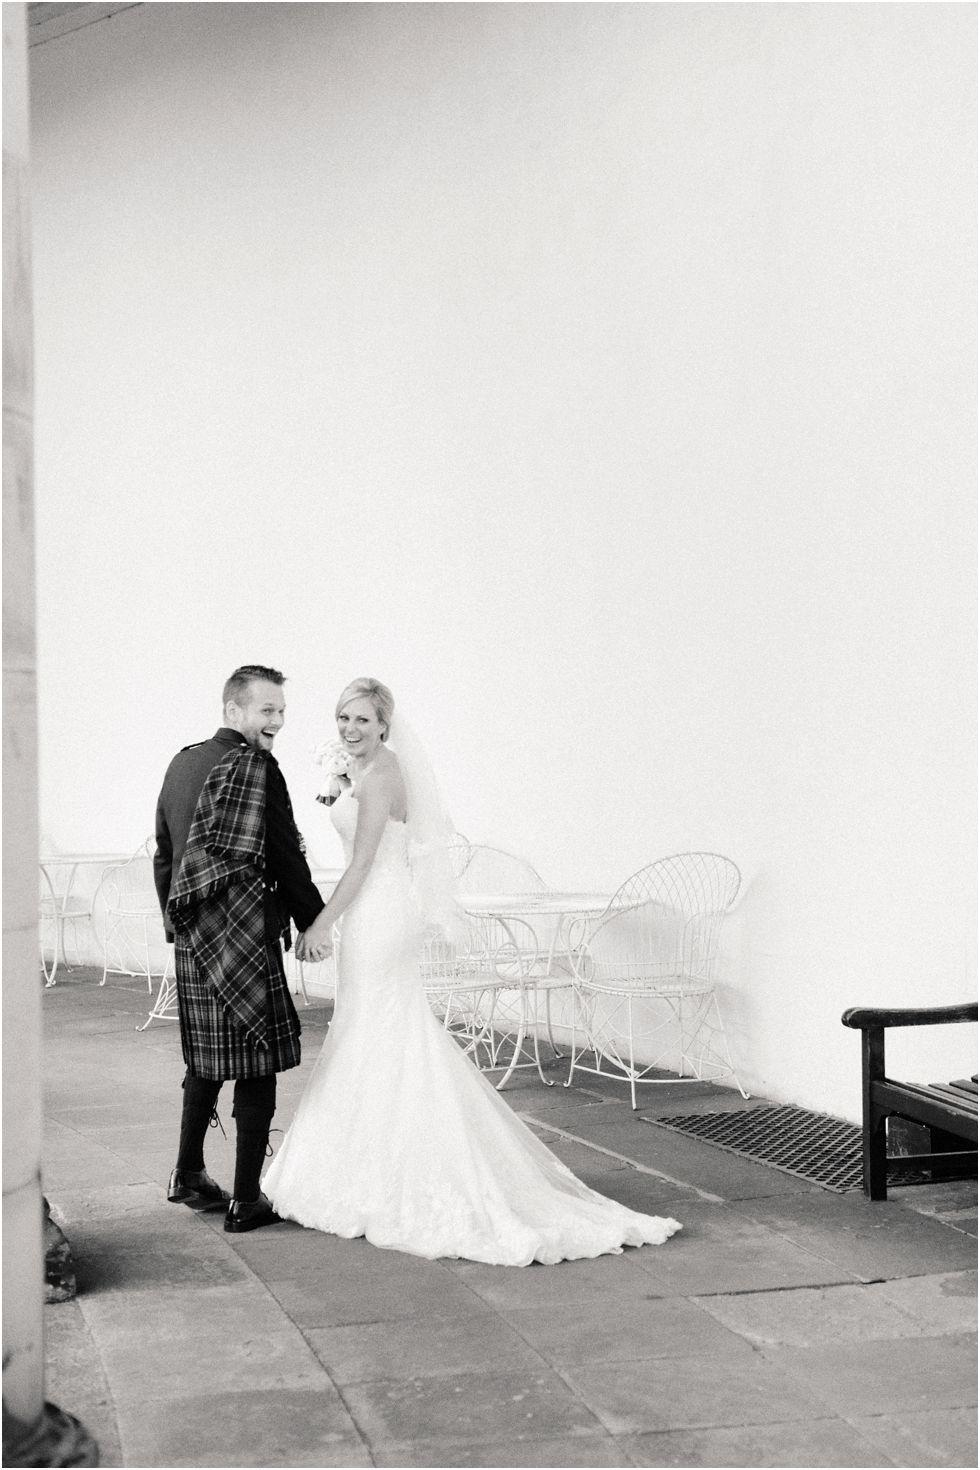 Hopetoun-House-wedding-photography-Edinburgh-37.jpg